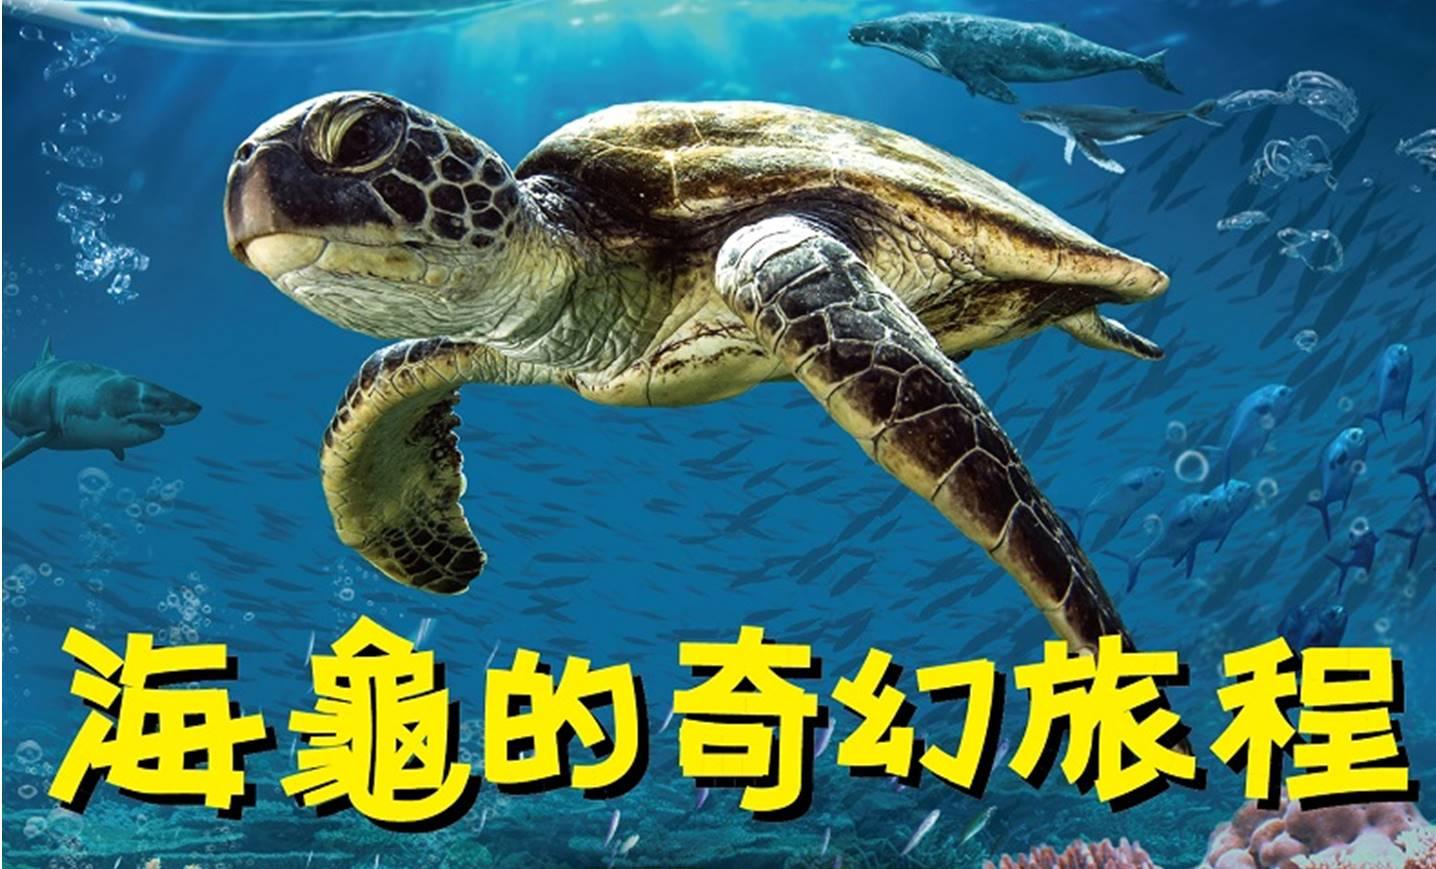 IMAX 3D 影片介紹-海龜的奇幻旅程(109/1/25上映)